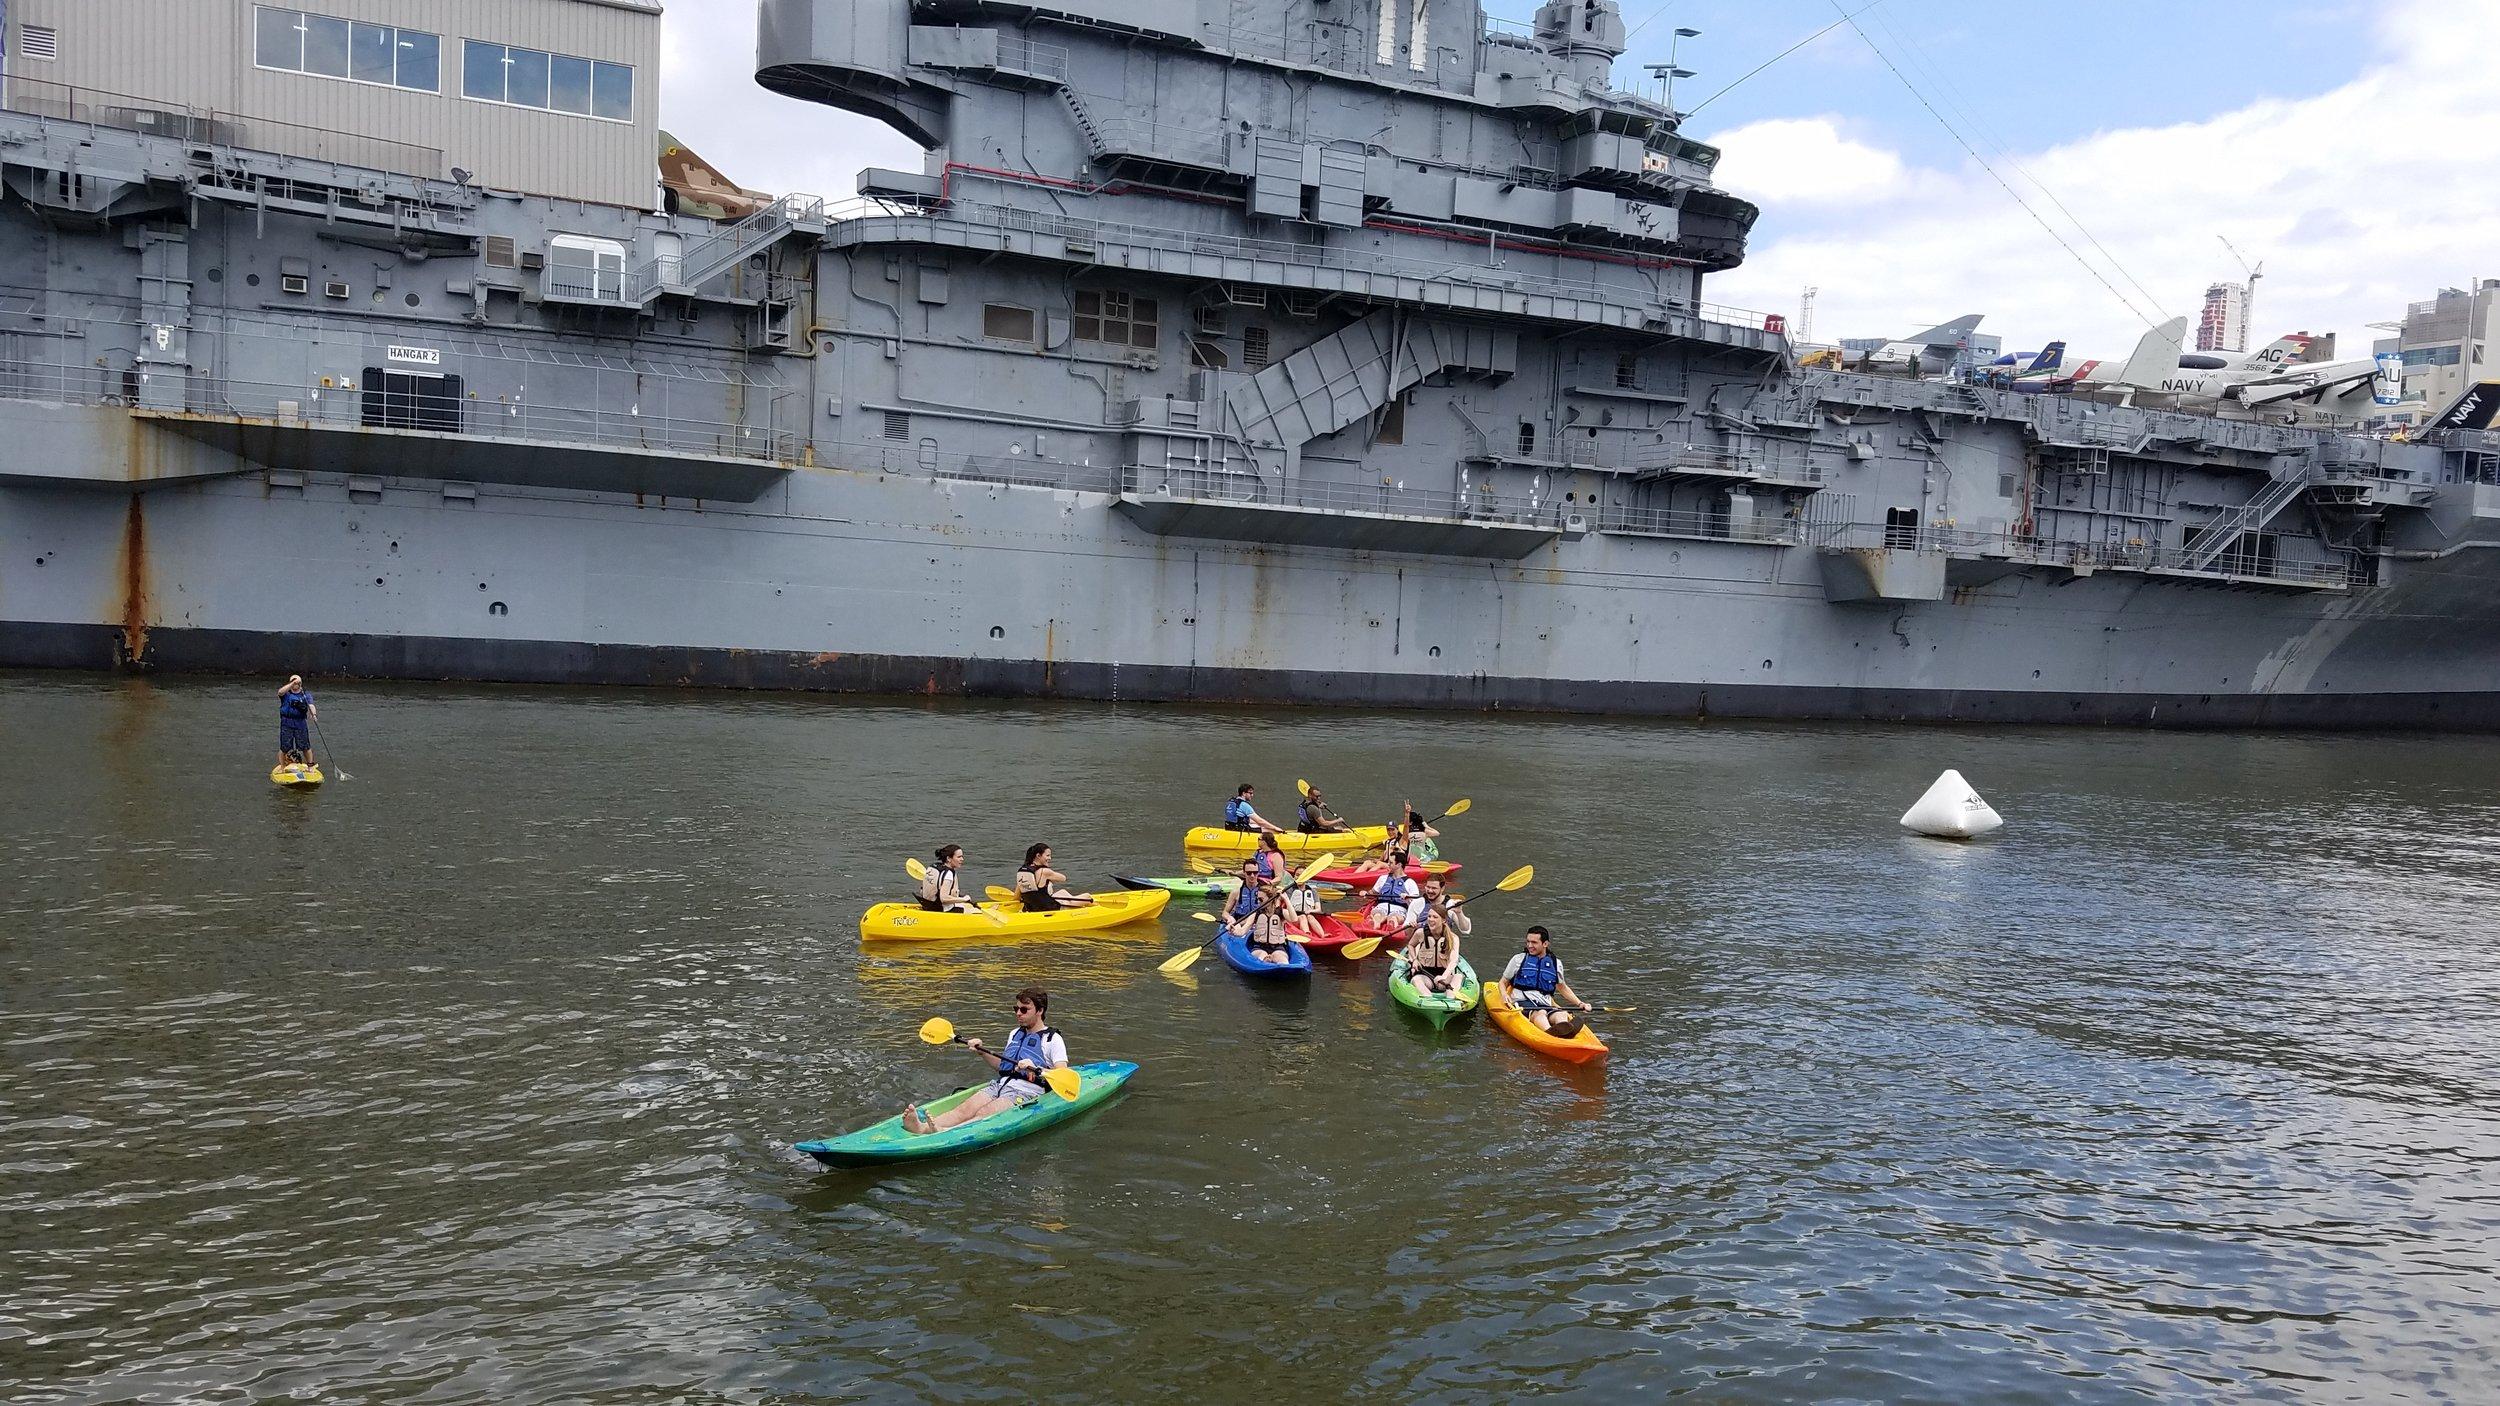 FulbrightNY_kayaking_ship_2017.JPG